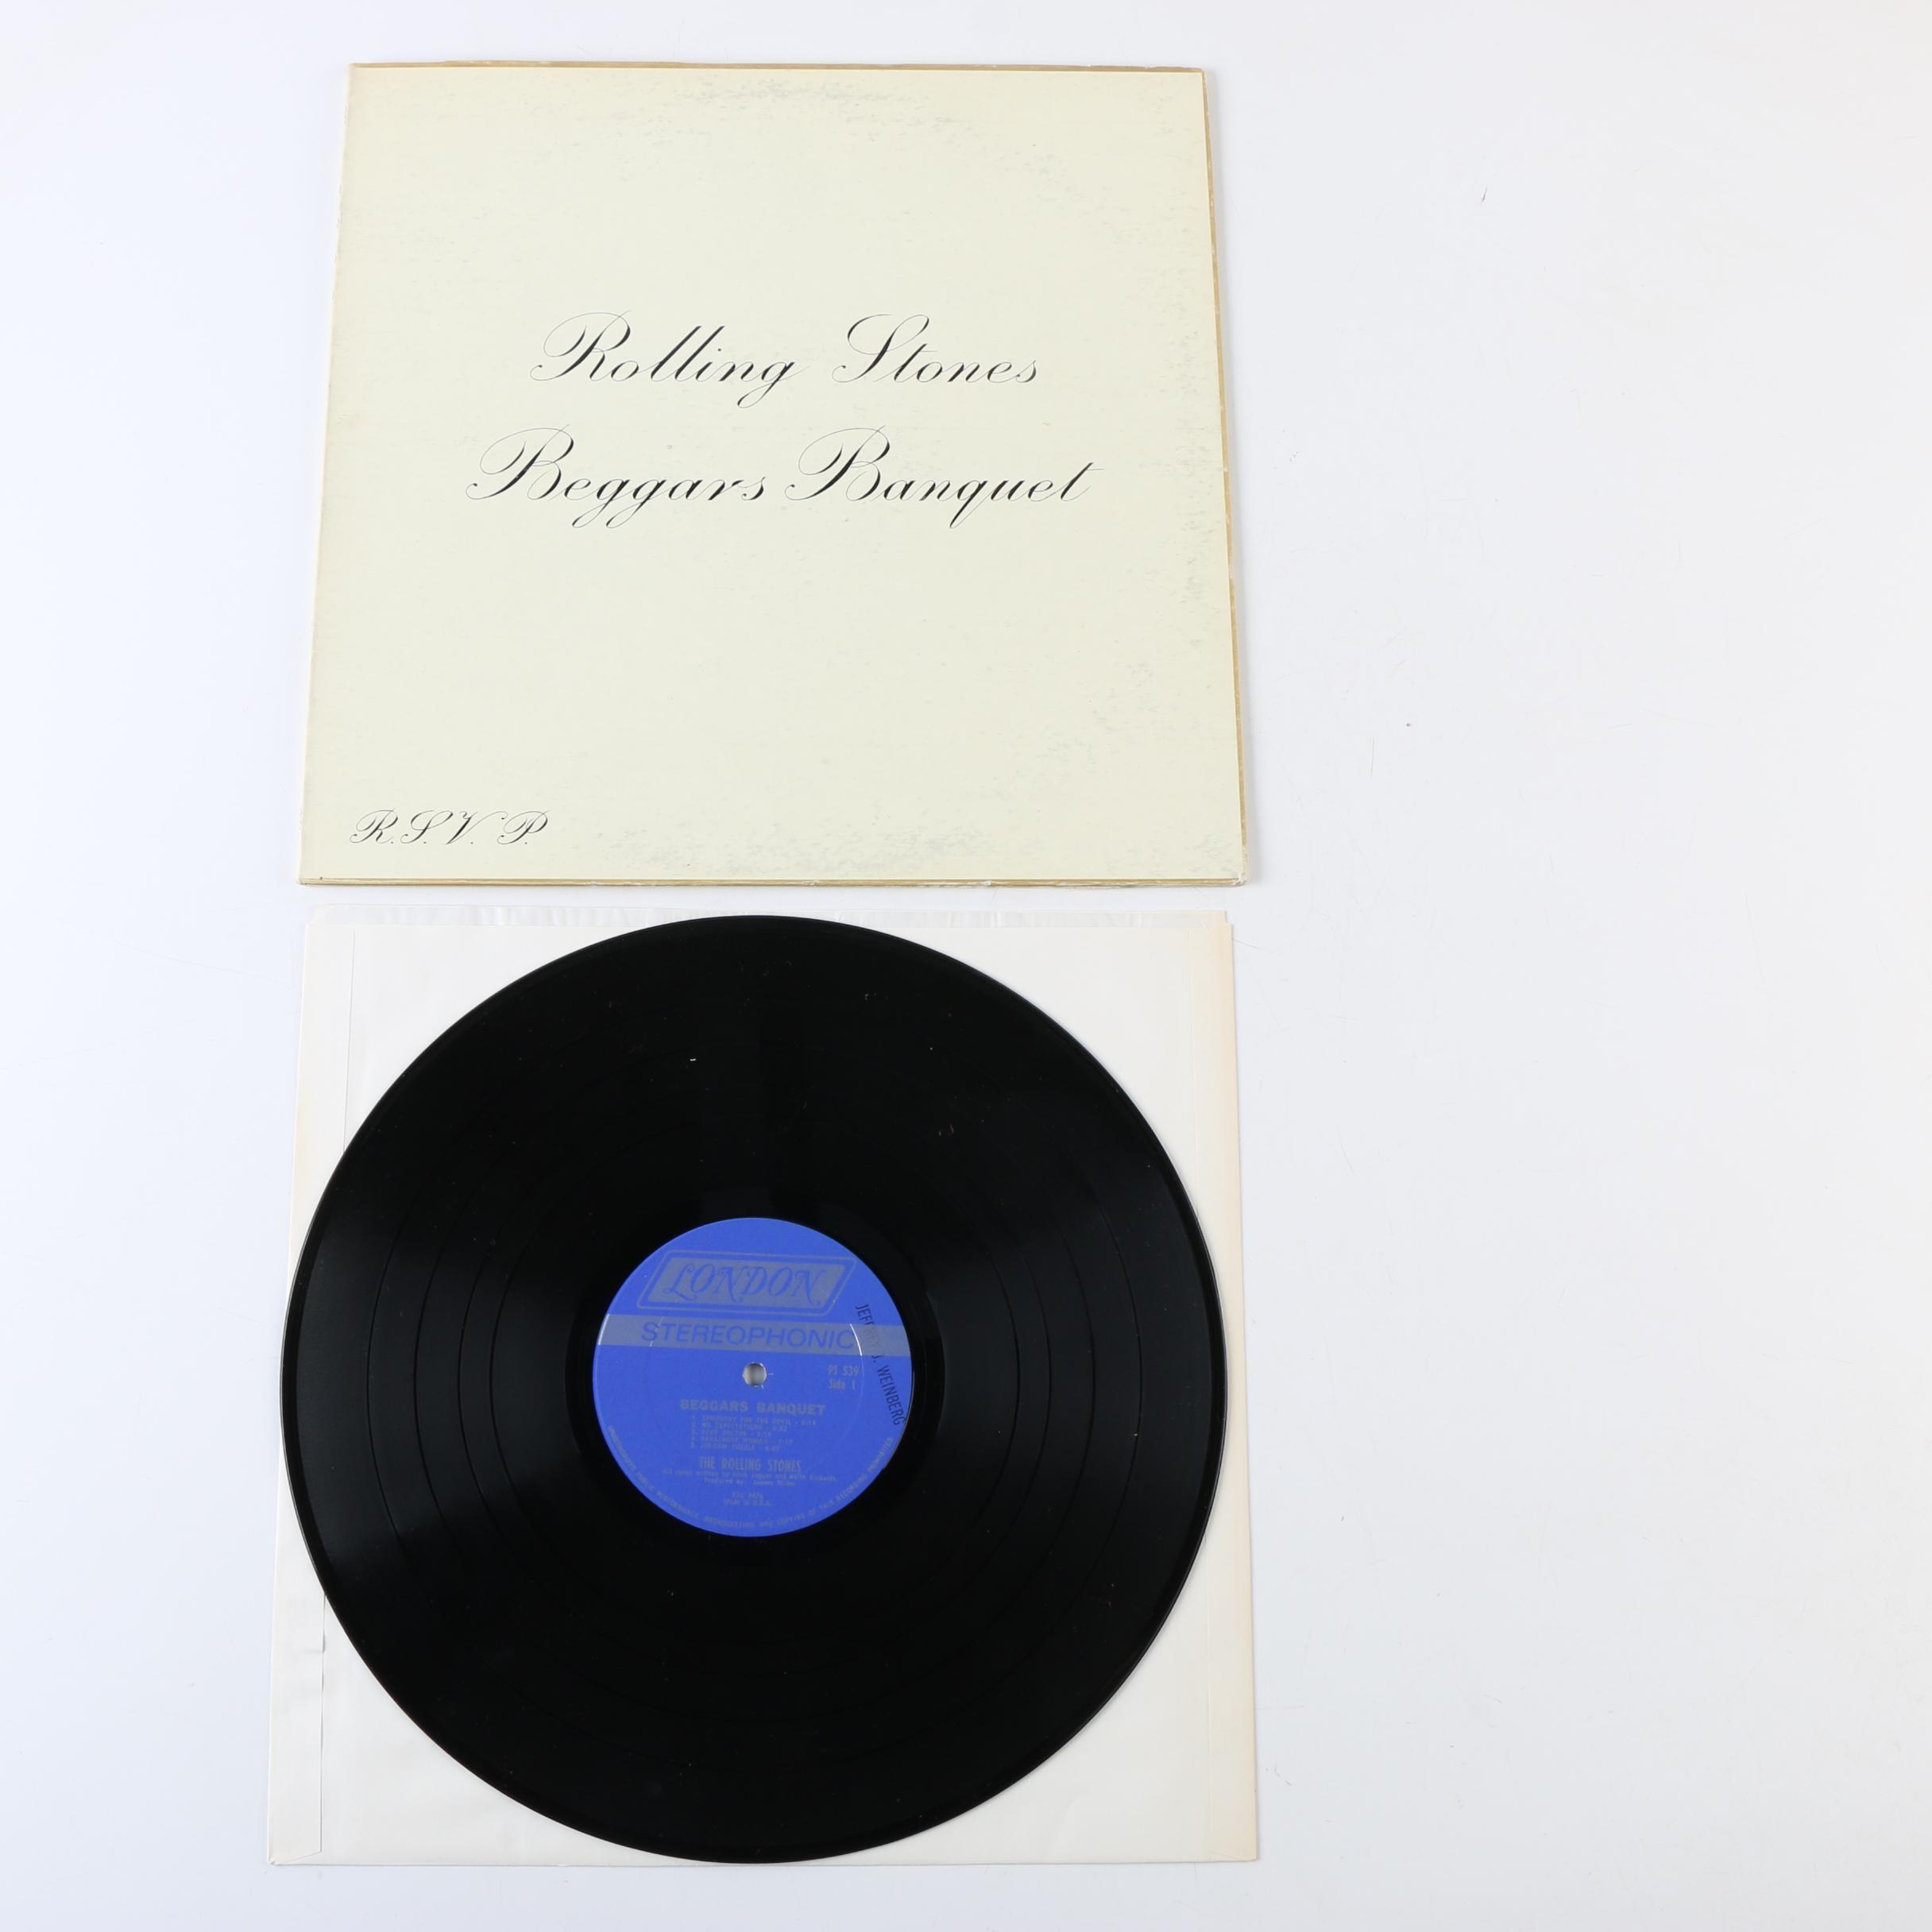 "The Rolling Stones ""Beggars Banquet"" Original U.S. Record Pressing"